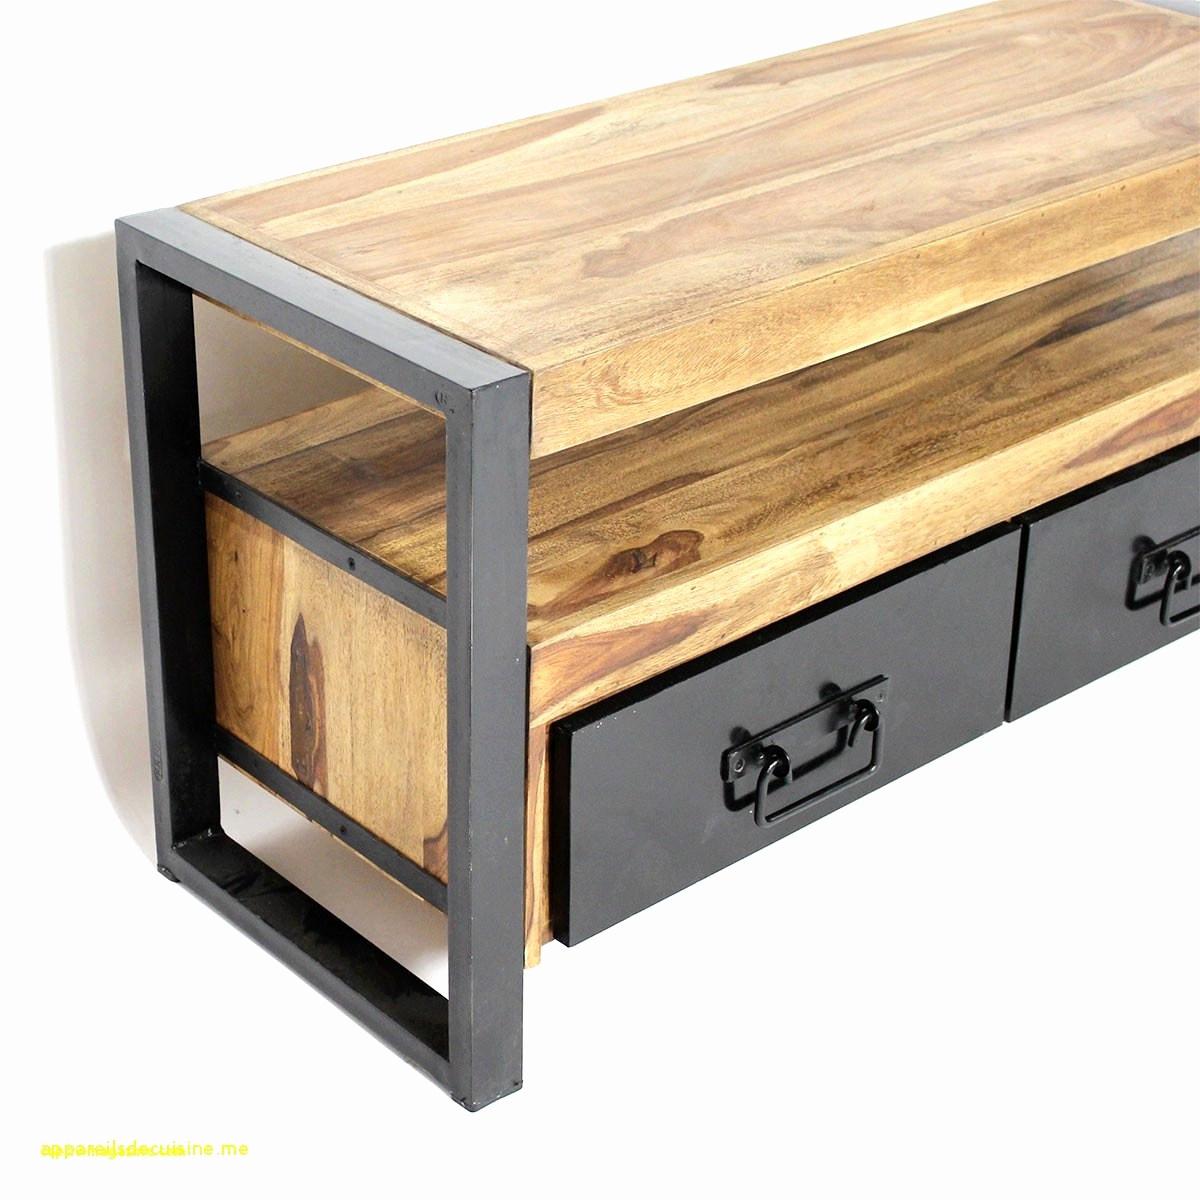 petite table conforama luxe petit meuble bois conforama meuble bureau unique armoire tiroir 0d of petite table conforama